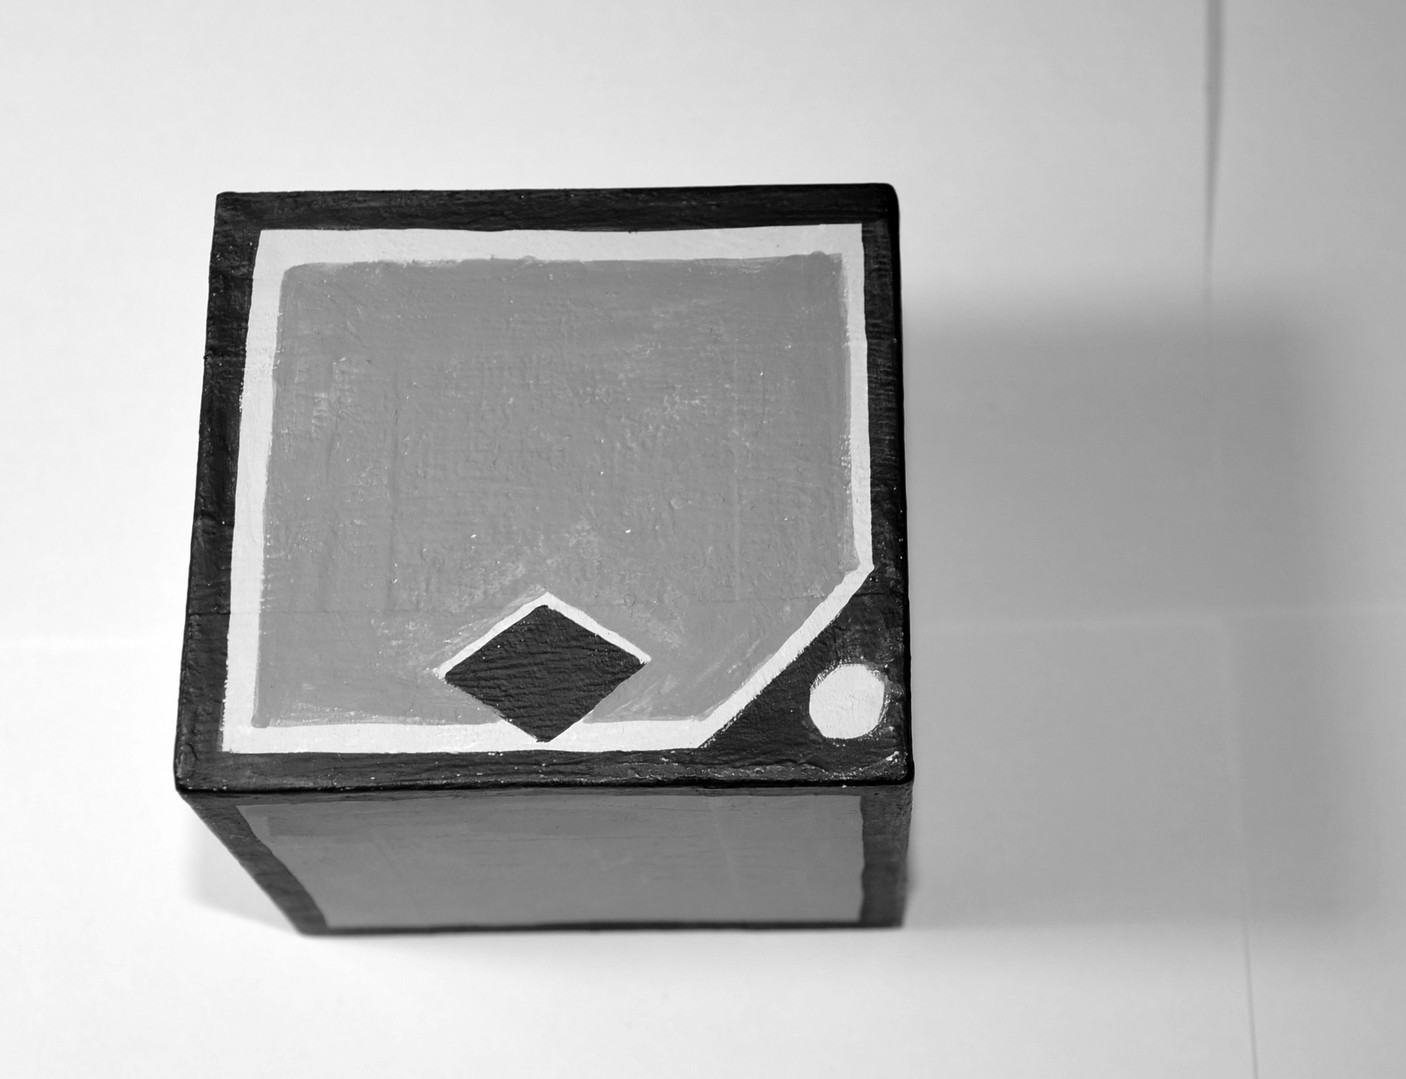 Square Agfa